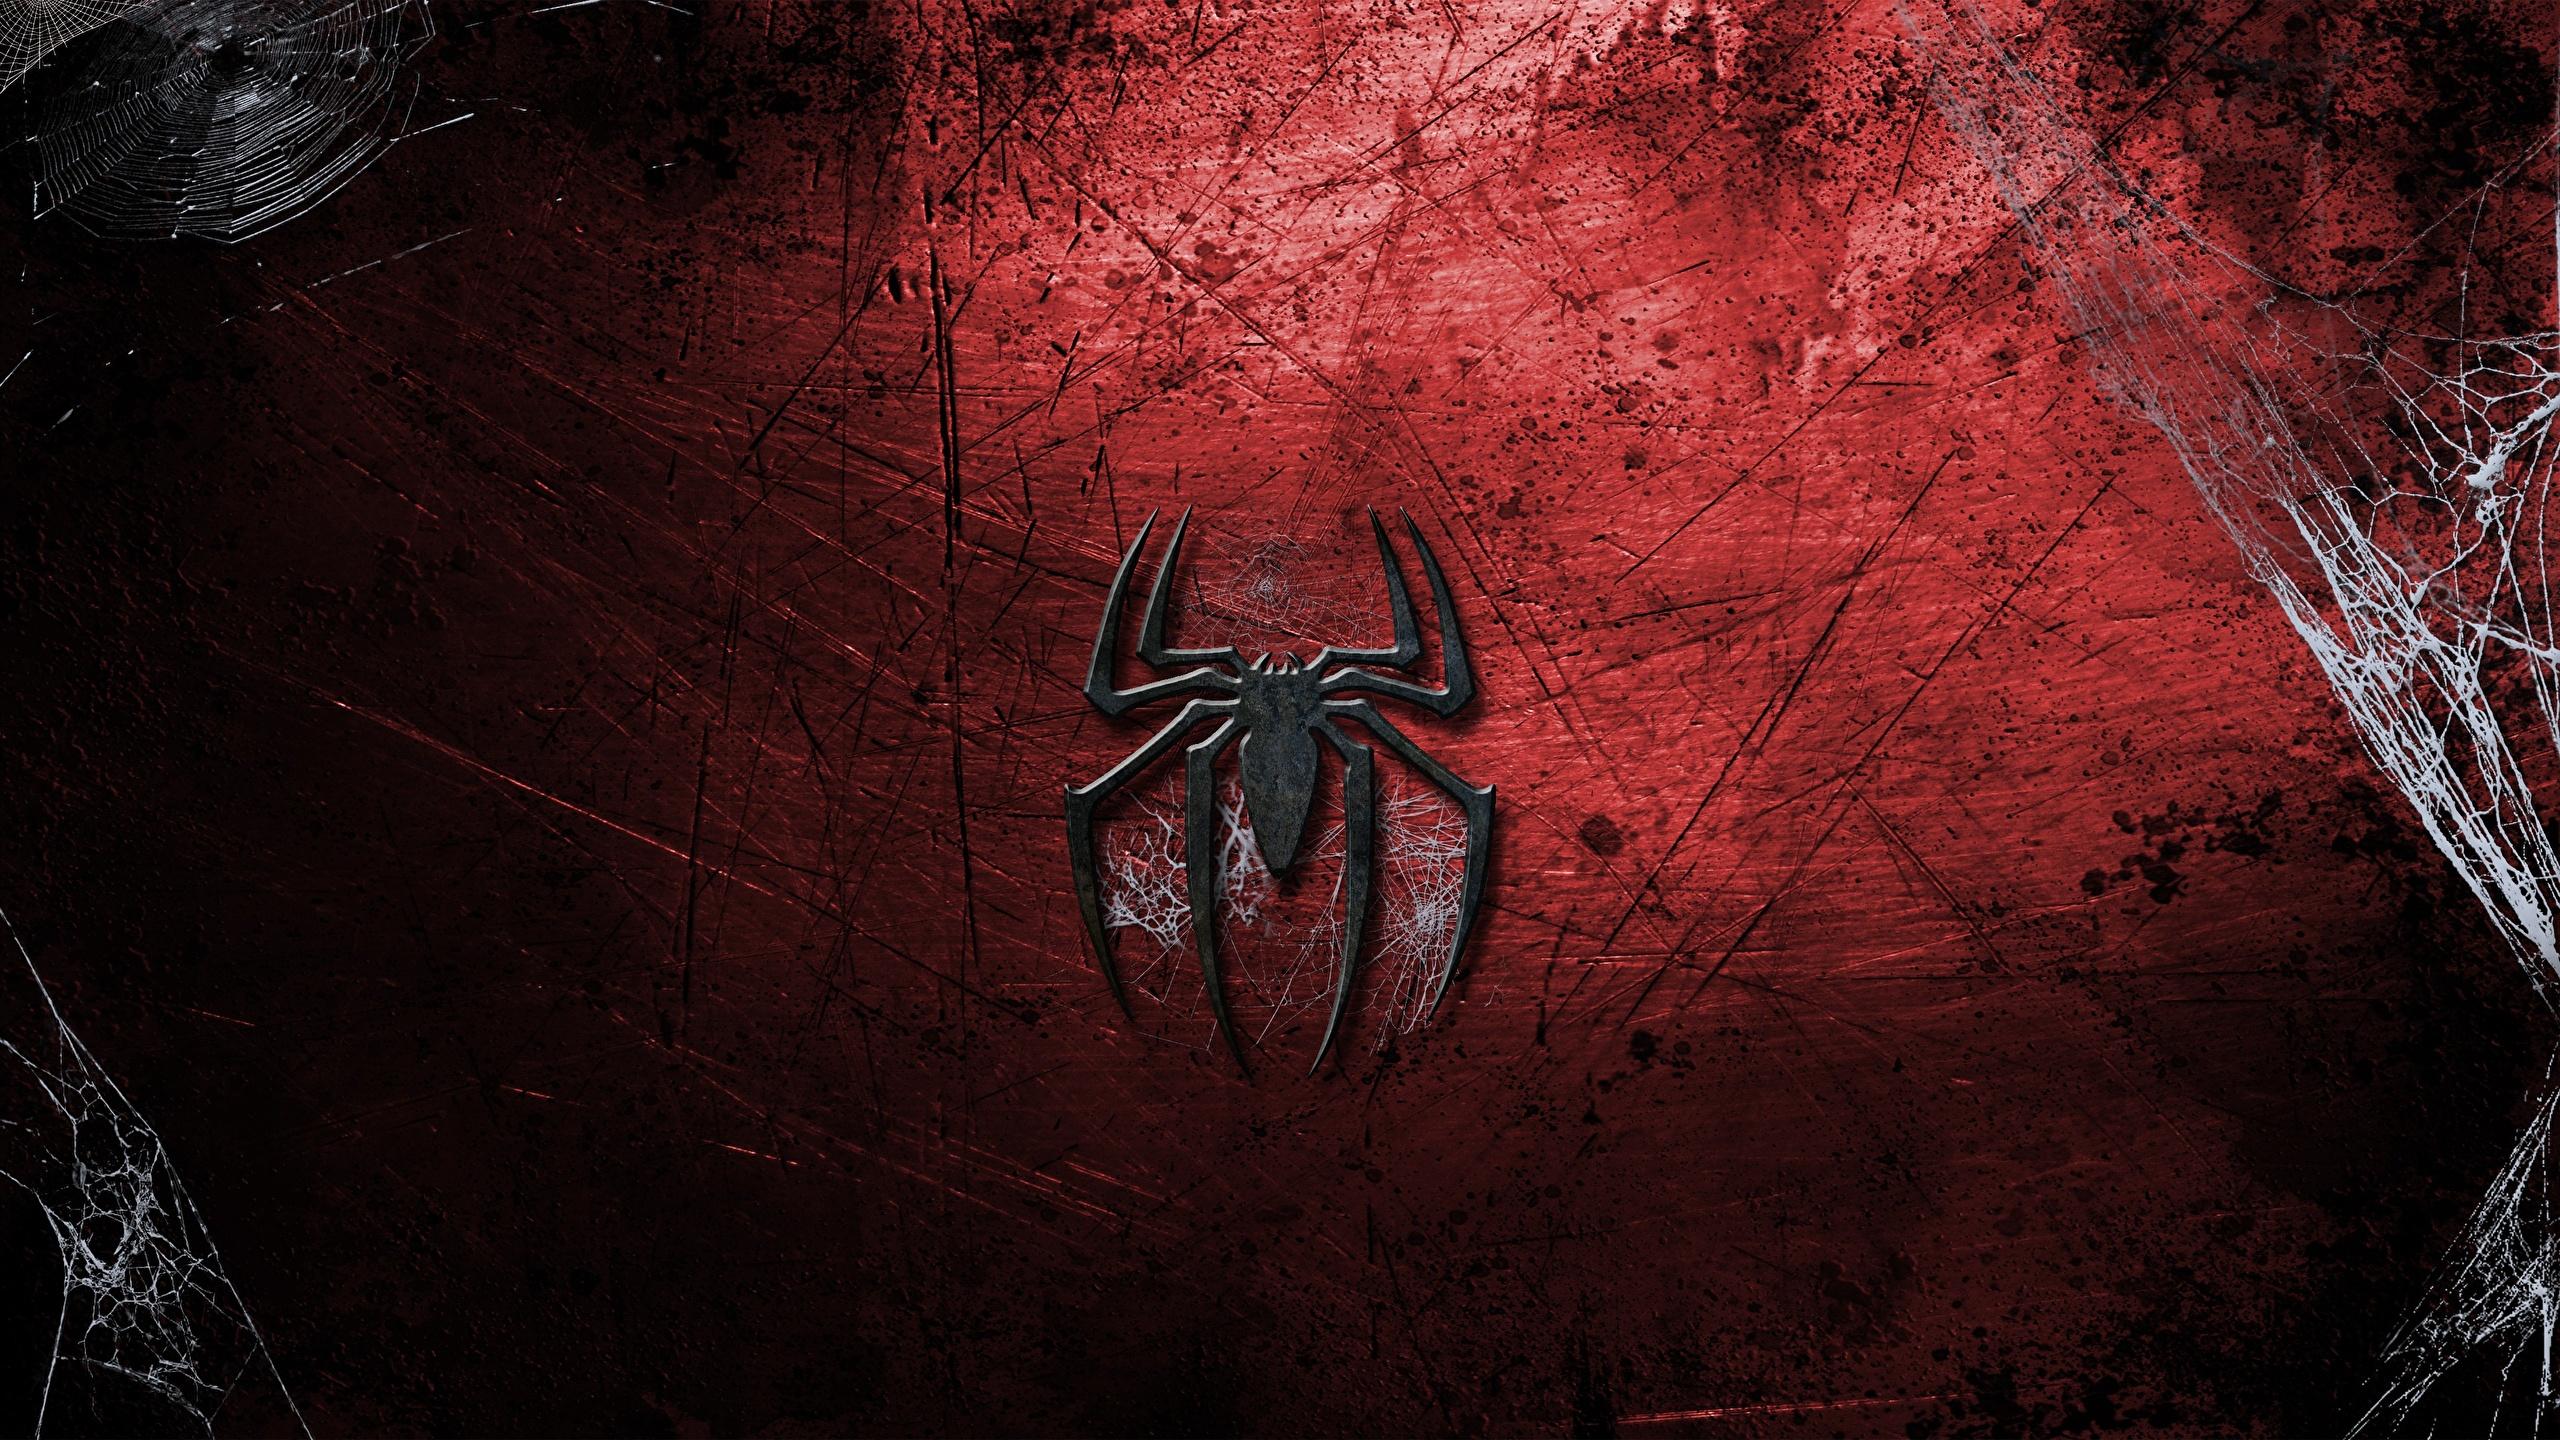 Wallpaper Spider Man Logo Emblem Movies 2560x1440